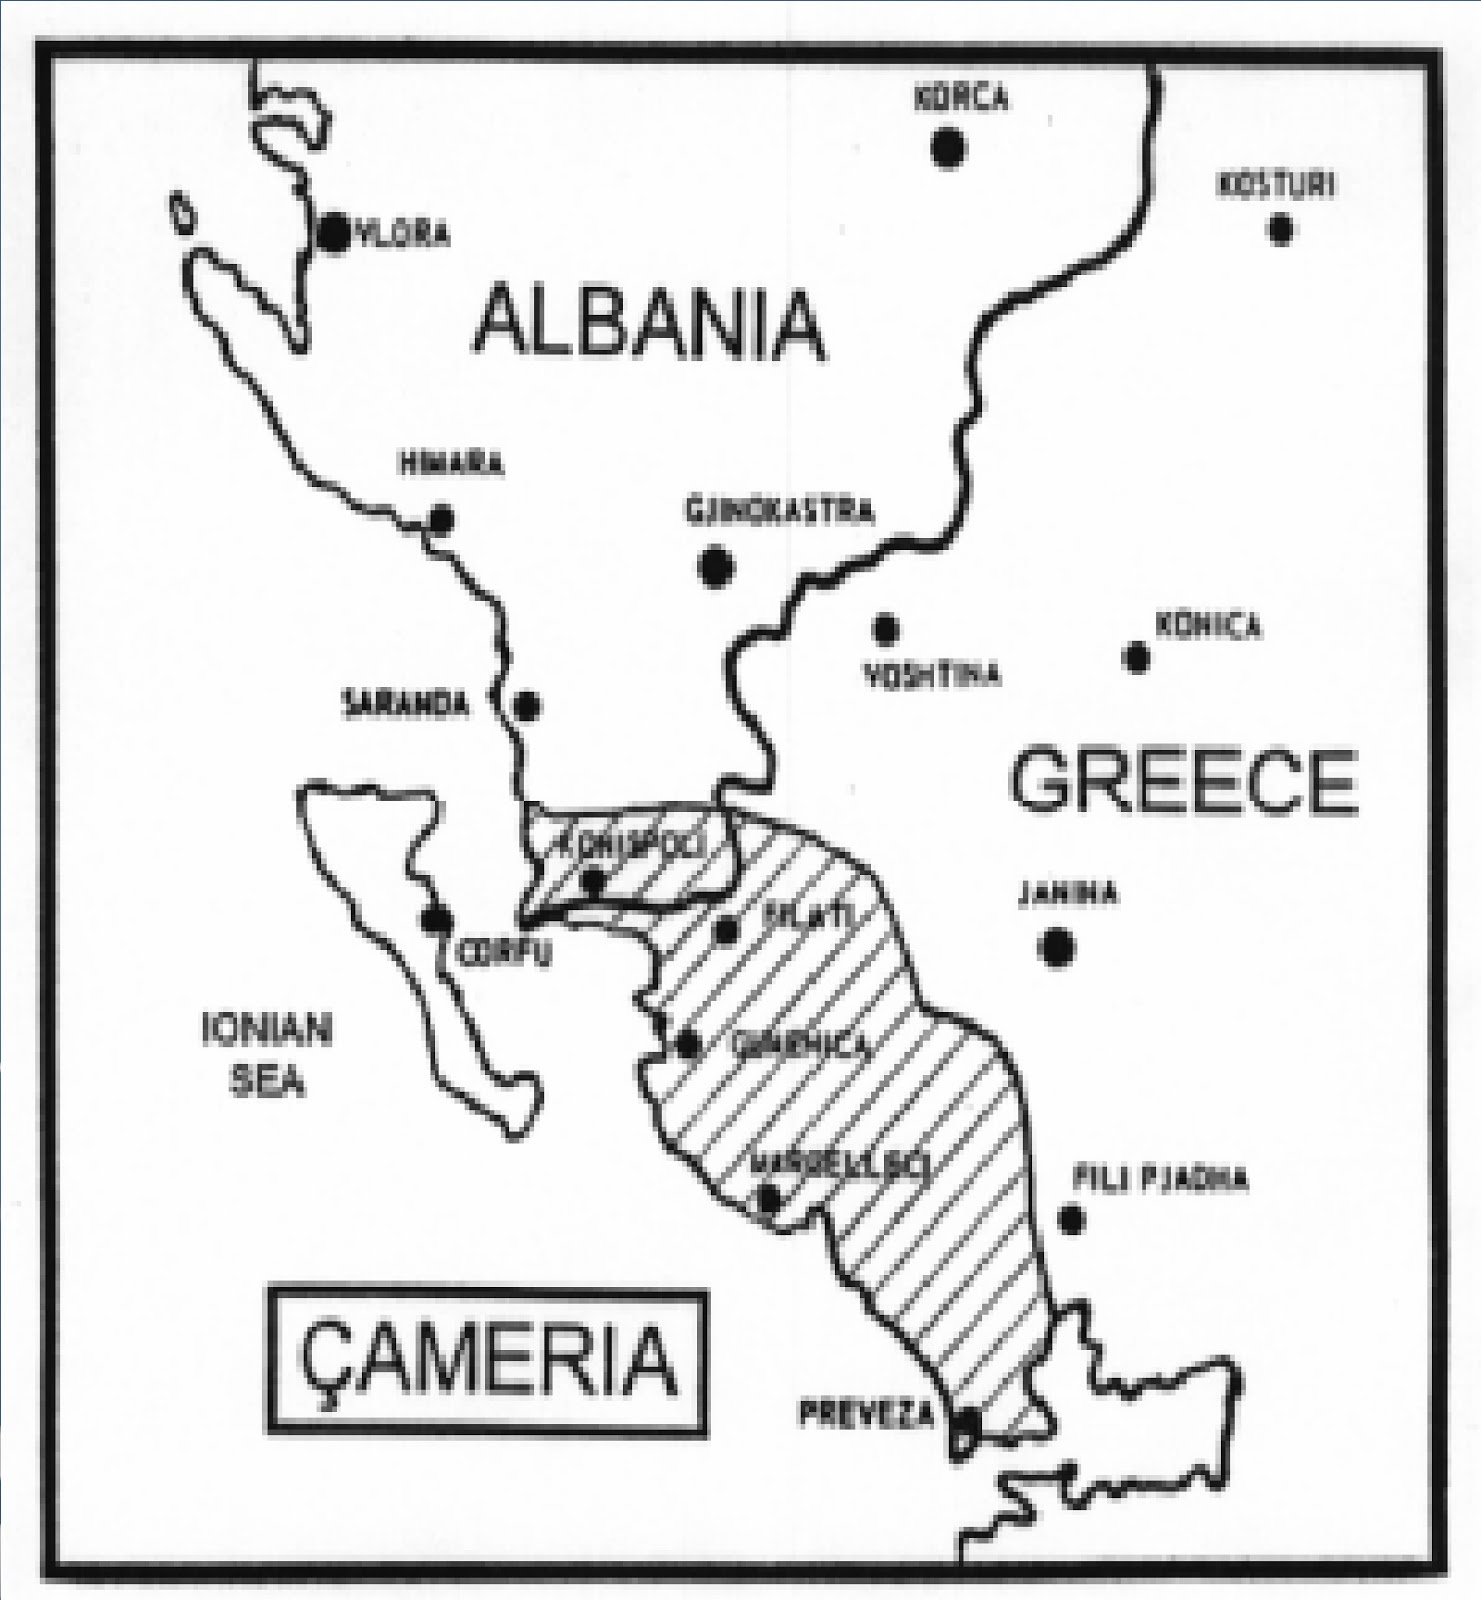 Photo of Ε.E και ΟΗΕ αναγνωρίζουν ανεξάρτητο Κράτος την ΤΣΑΜΟΥΡΙΑ εντός Ελλάδος με Τσιπρα να μιλά για αλλαγή συνόρων